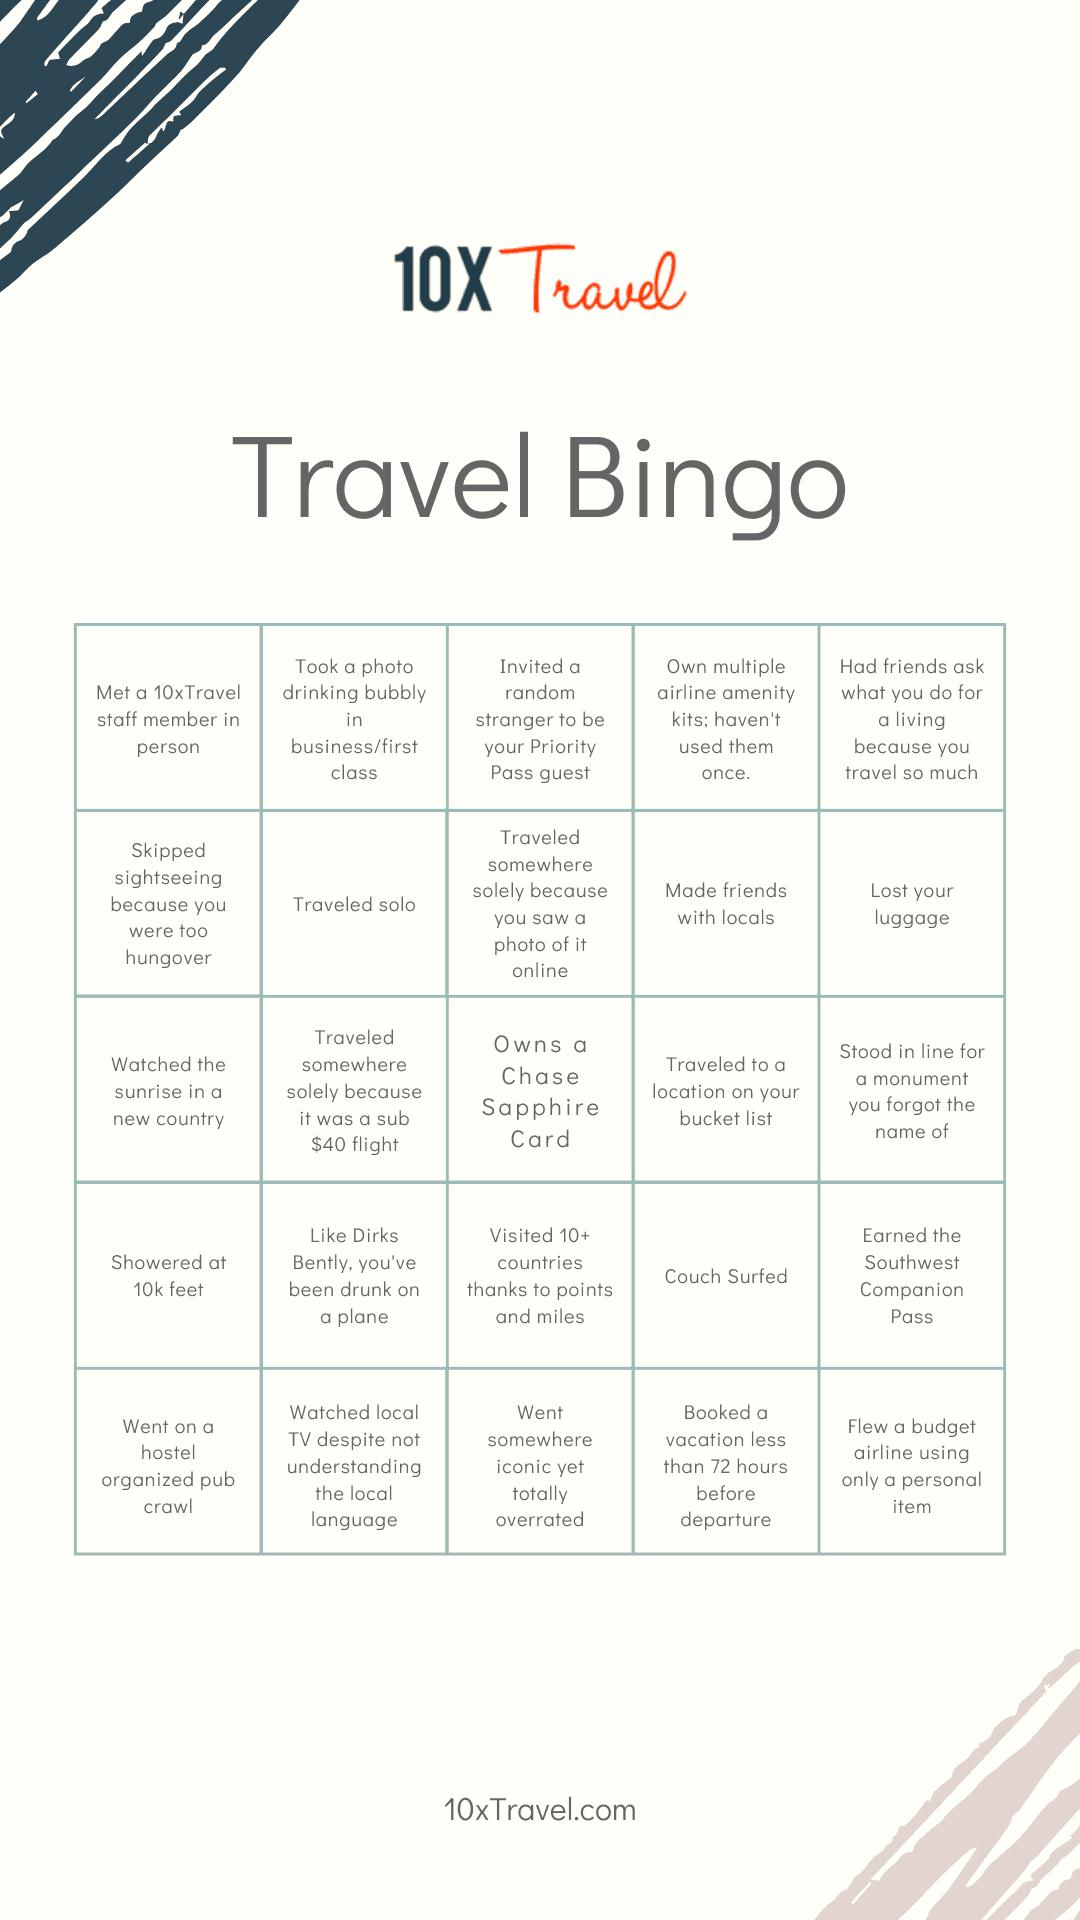 10xTravel bingo card